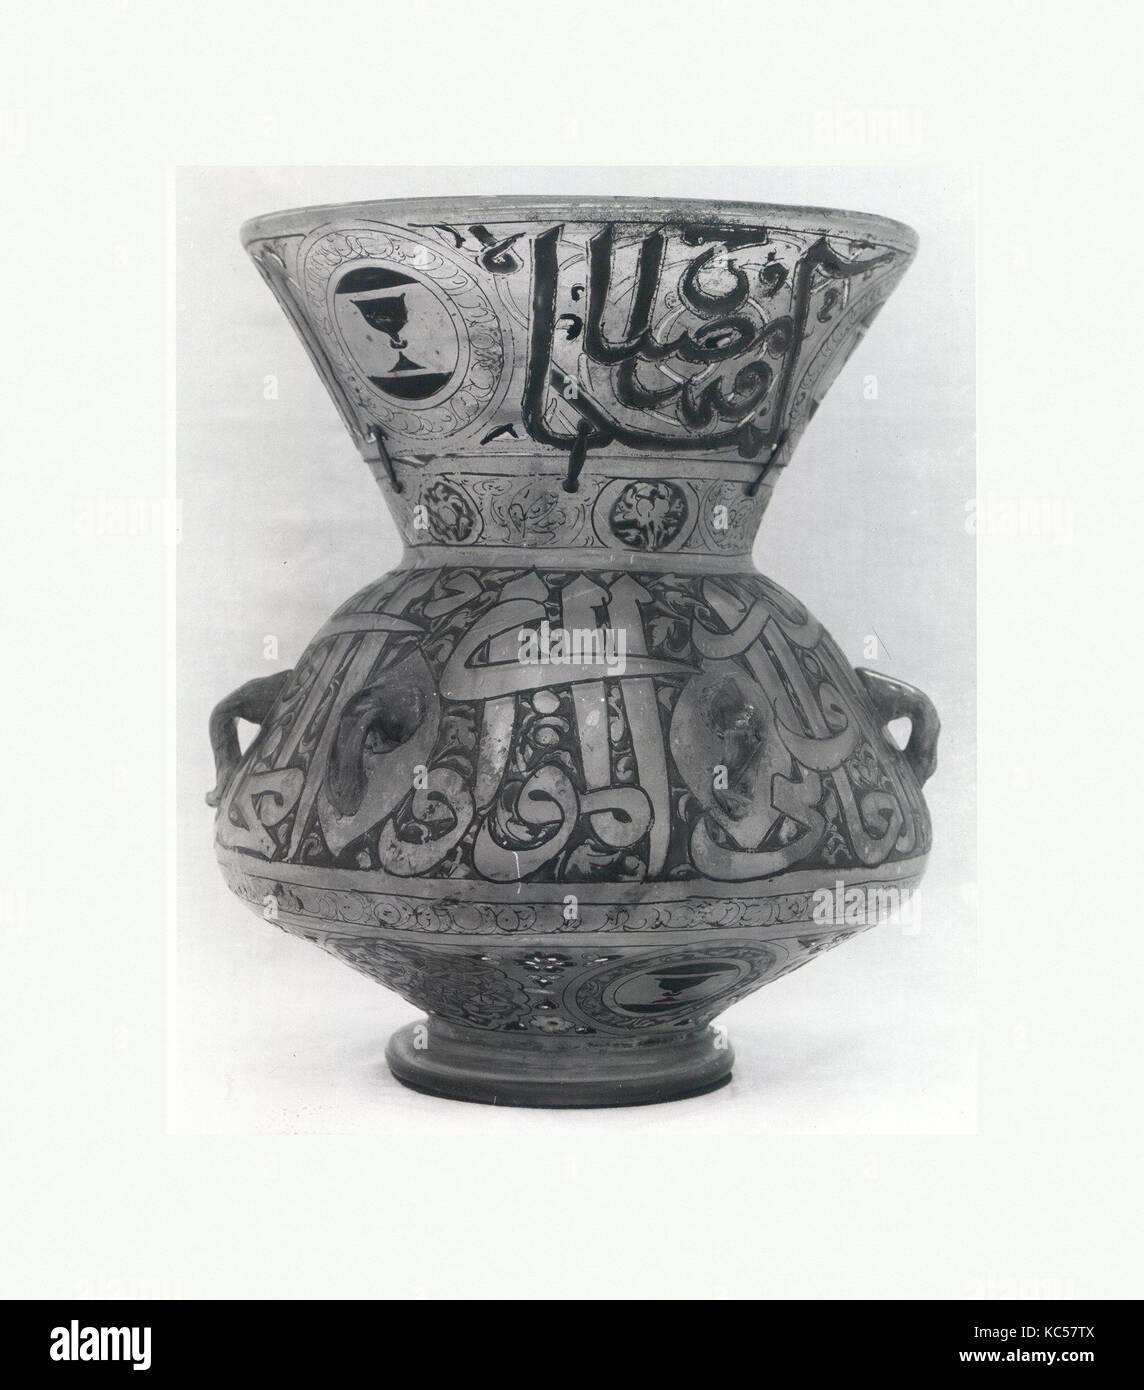 Mosque Lamp of Amir Sayf al-Din Shaykhu, ca. 1349–55 - Stock Image